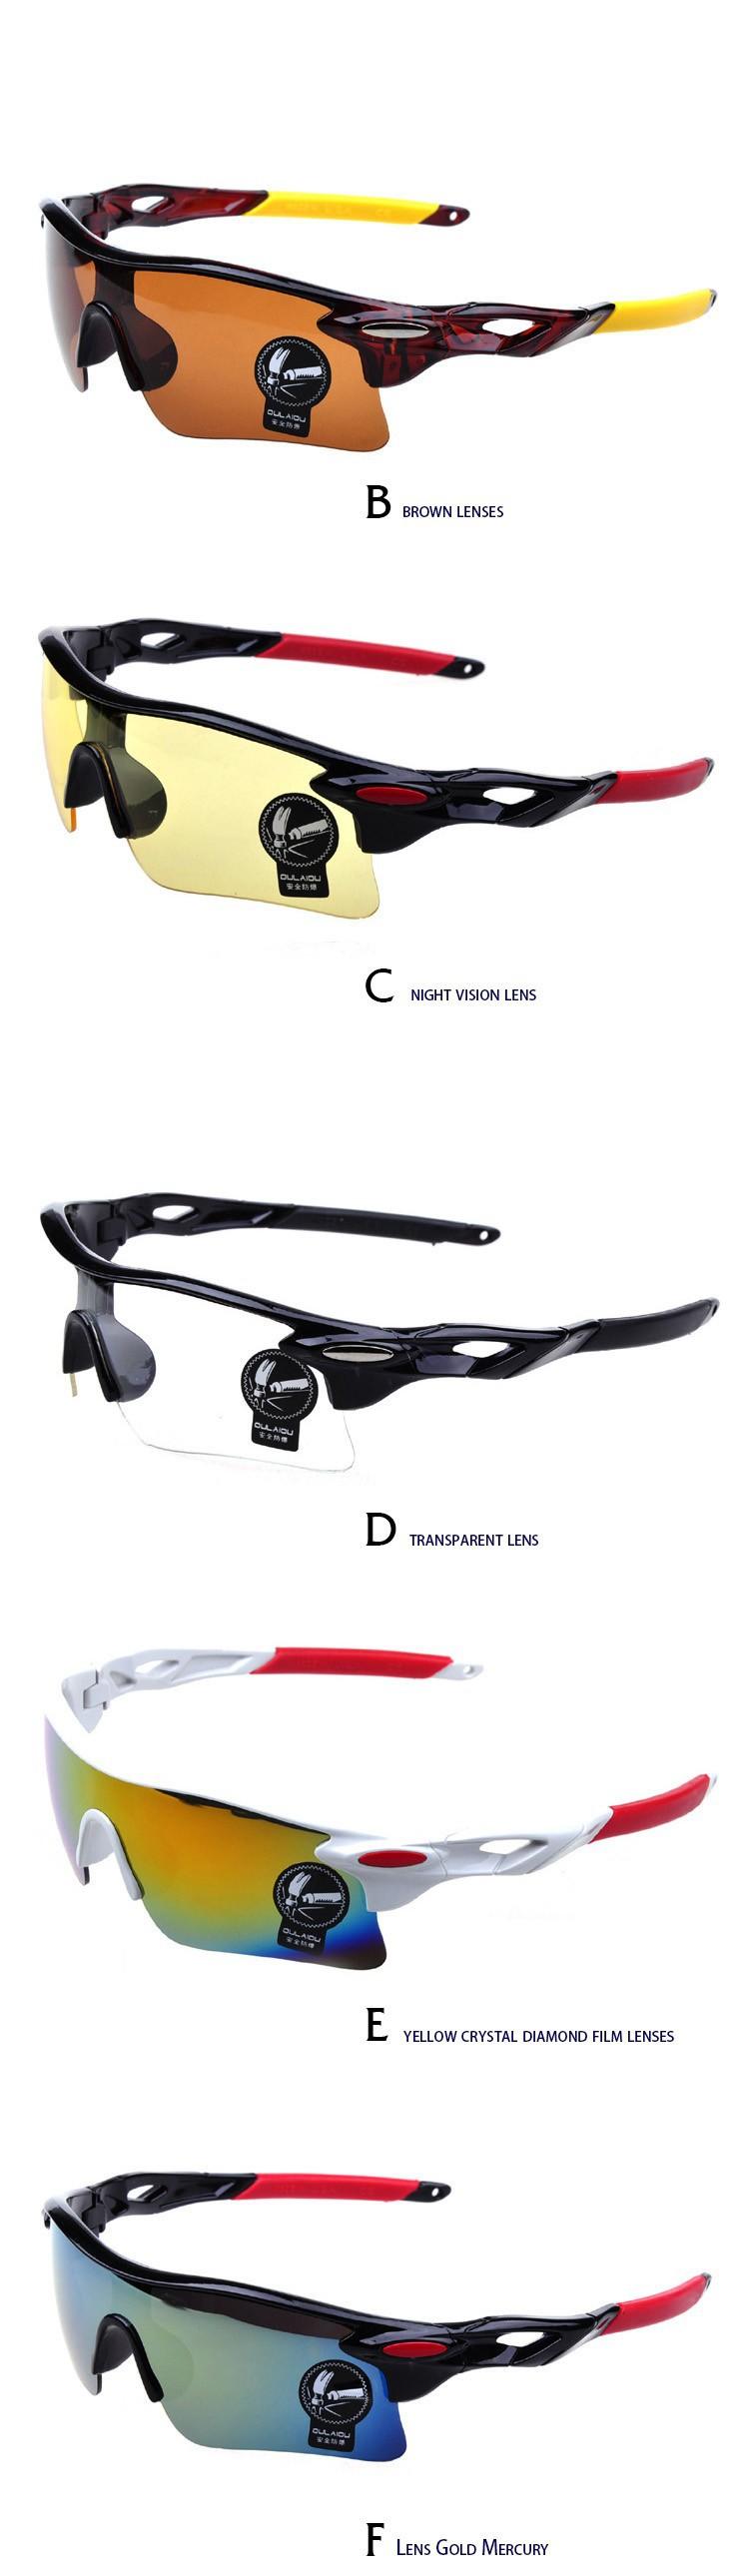 1 Set 2014 Men Cycling Glasses Fashion UV400 Outdoor Sports Eyewear